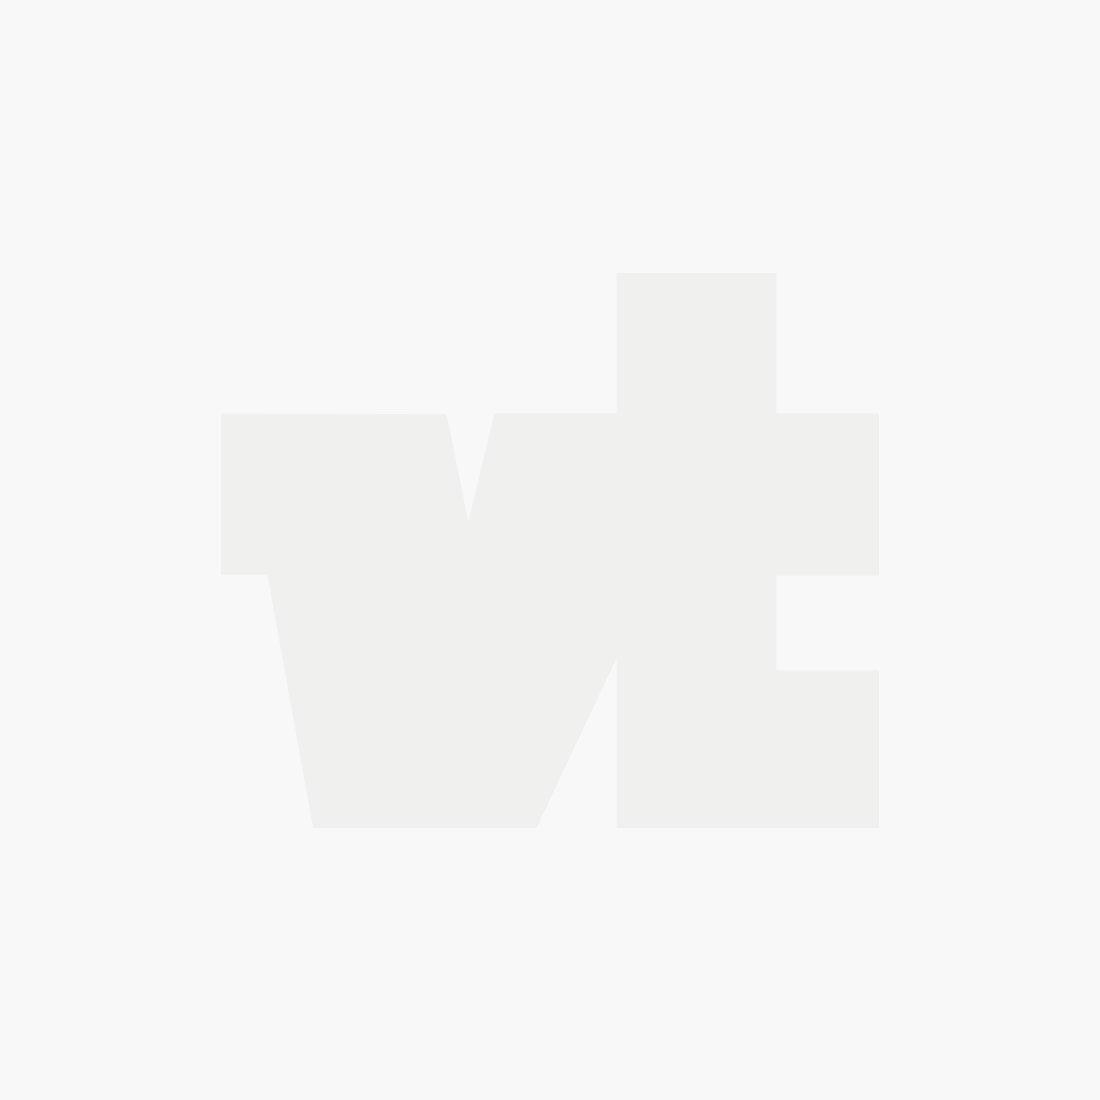 Akesha leder blouse jasje black